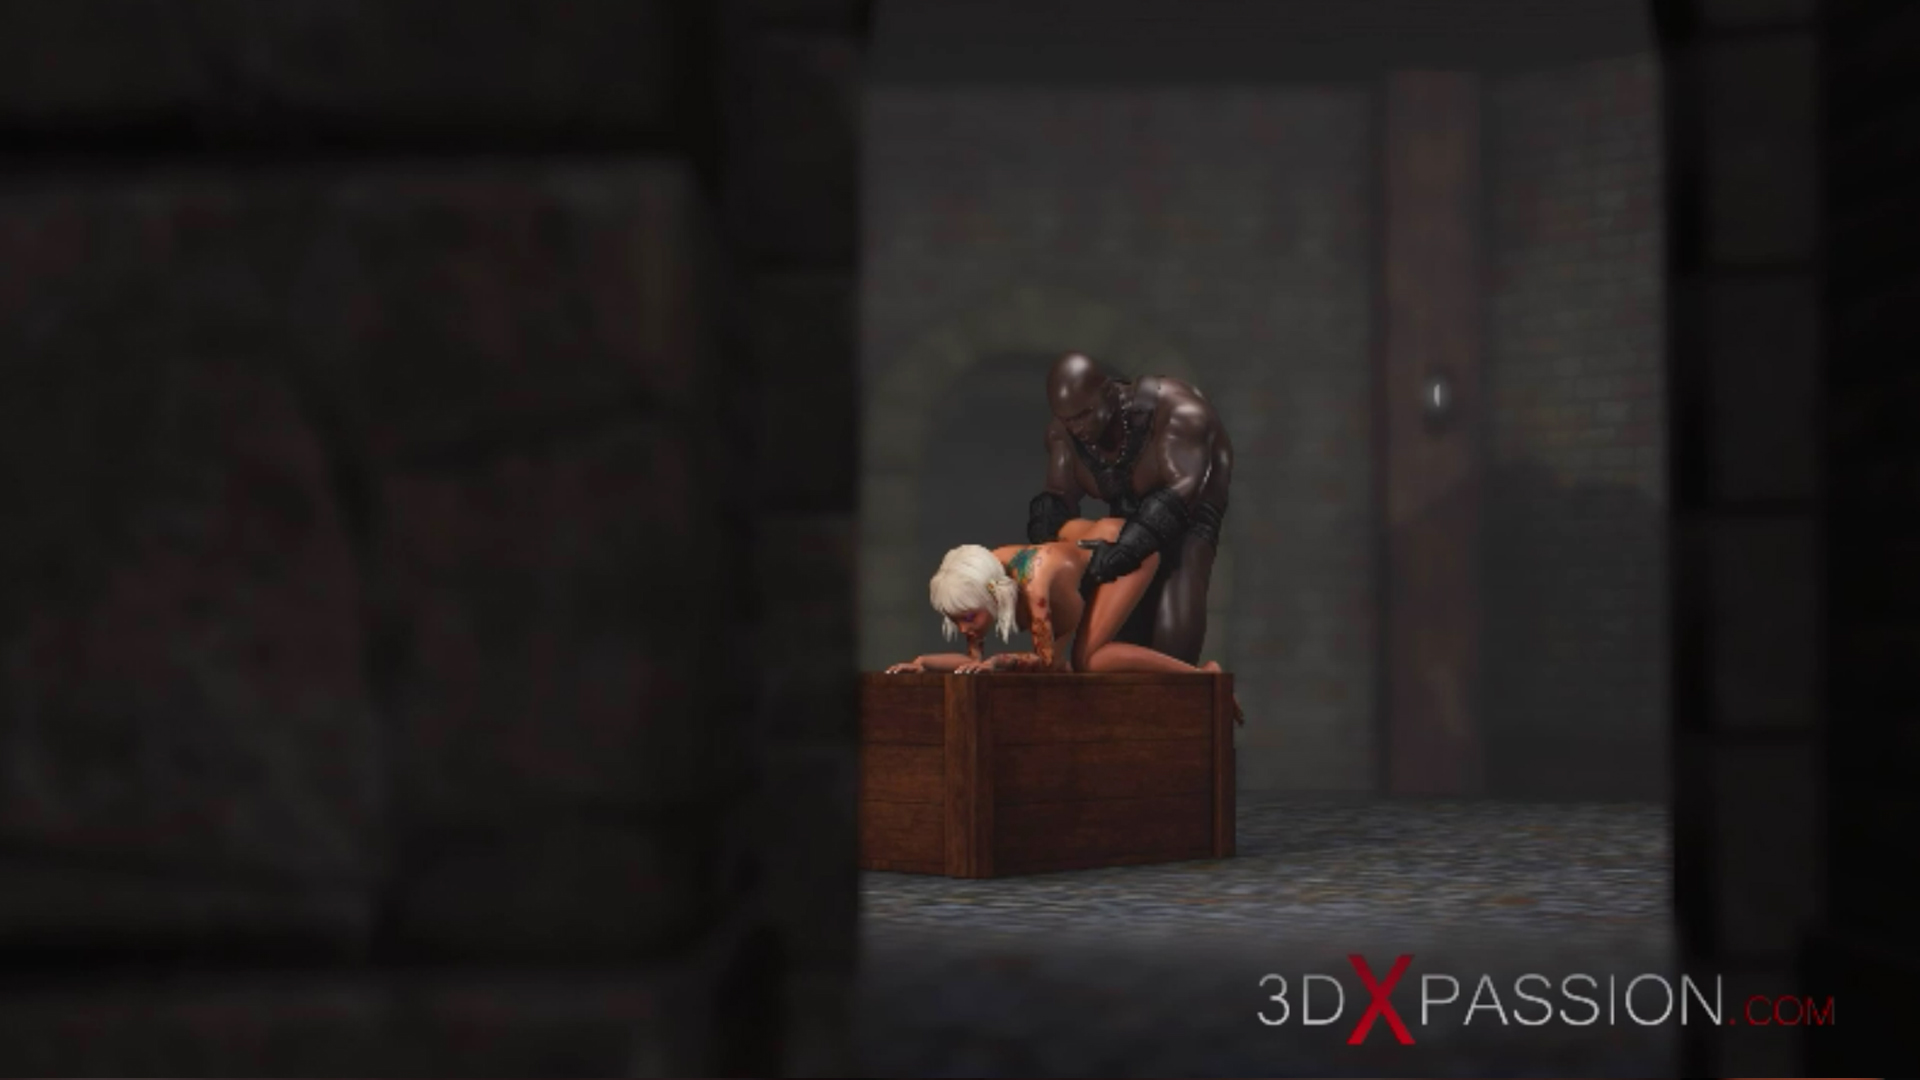 Sweet schoolgirl doggystyle black man dungeon anal